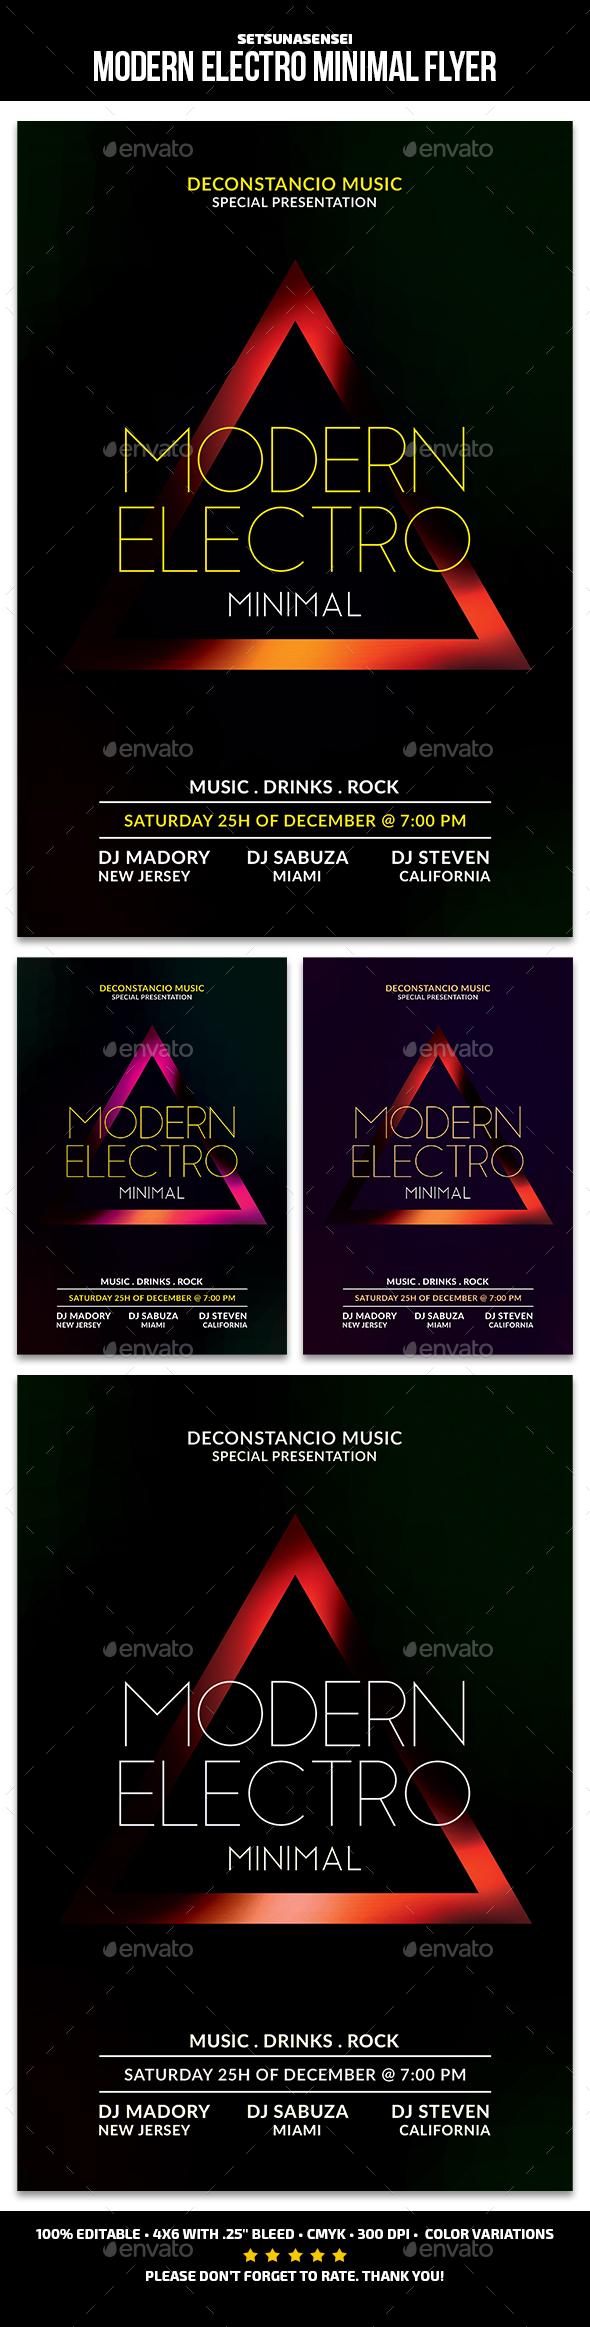 GraphicRiver Modern Electro Minimal Flyer 21132279